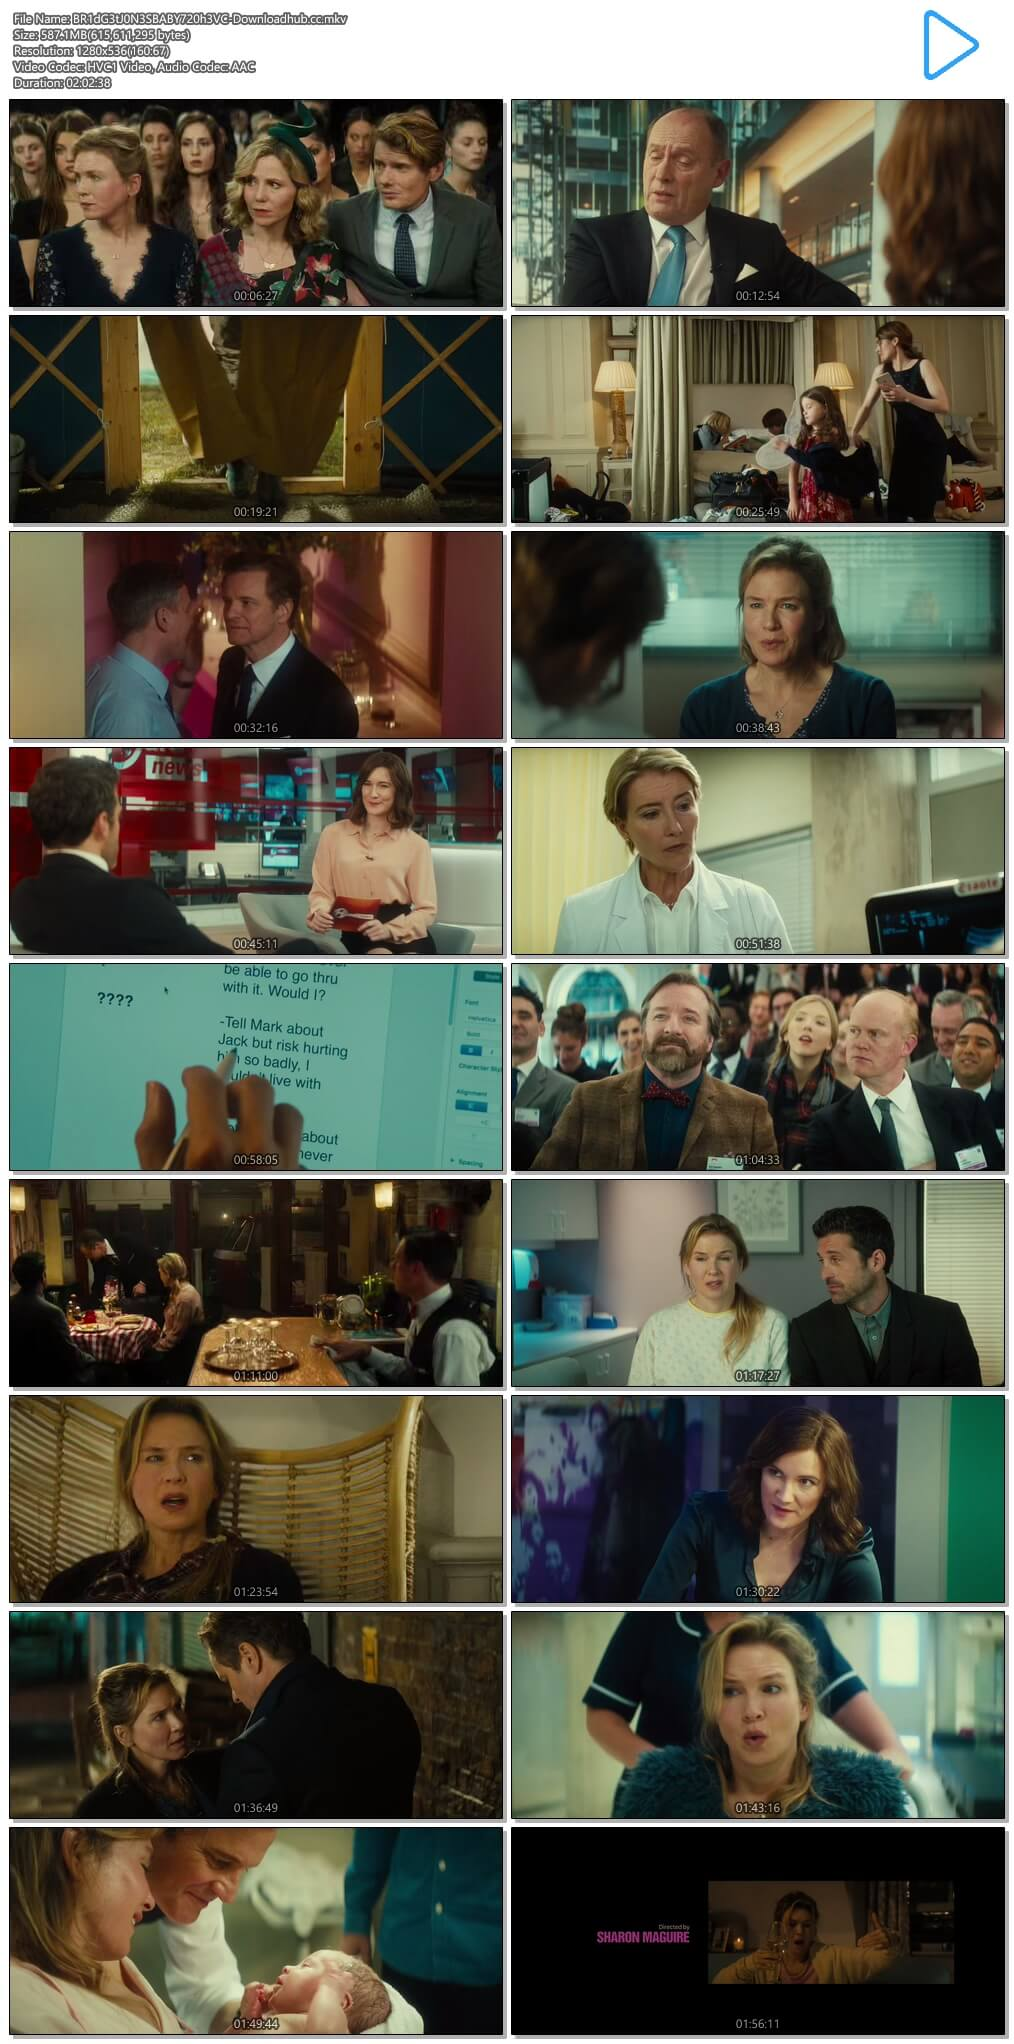 Bridget Joness Baby 2016 Hindi Dual Audio 550MB BluRay 720p ESubs HEVC